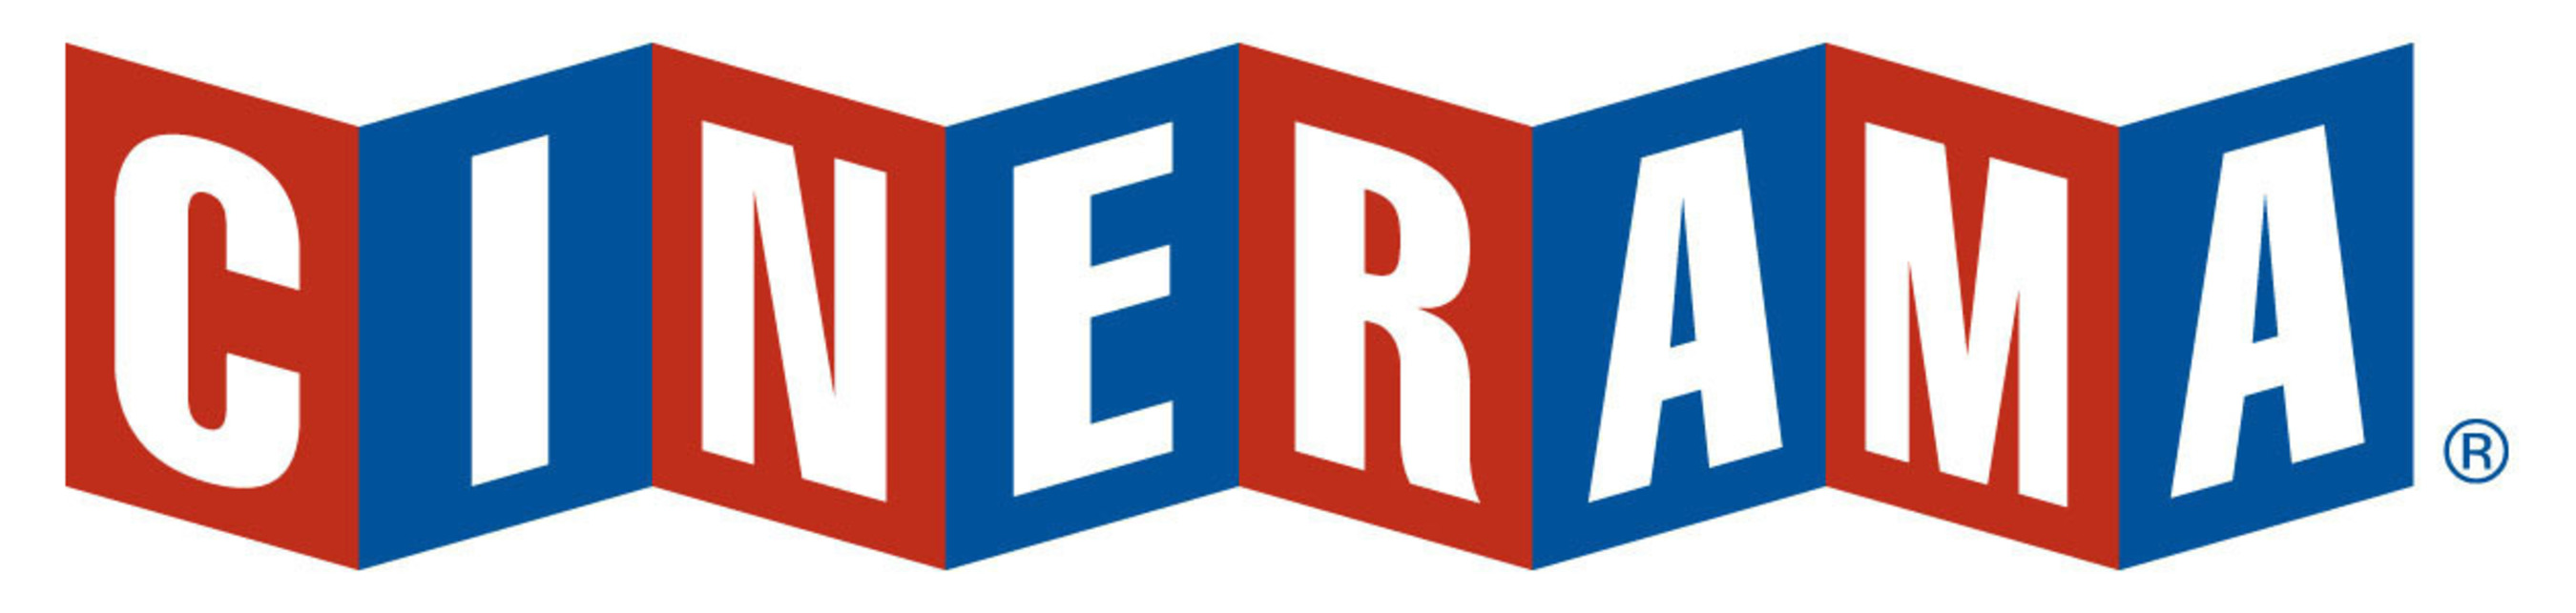 Seattle Cinerama logo. (PRNewsFoto/Seattle Cinerama Theater) (PRNewsFoto/SEATTLE CINERAMA THEATER)